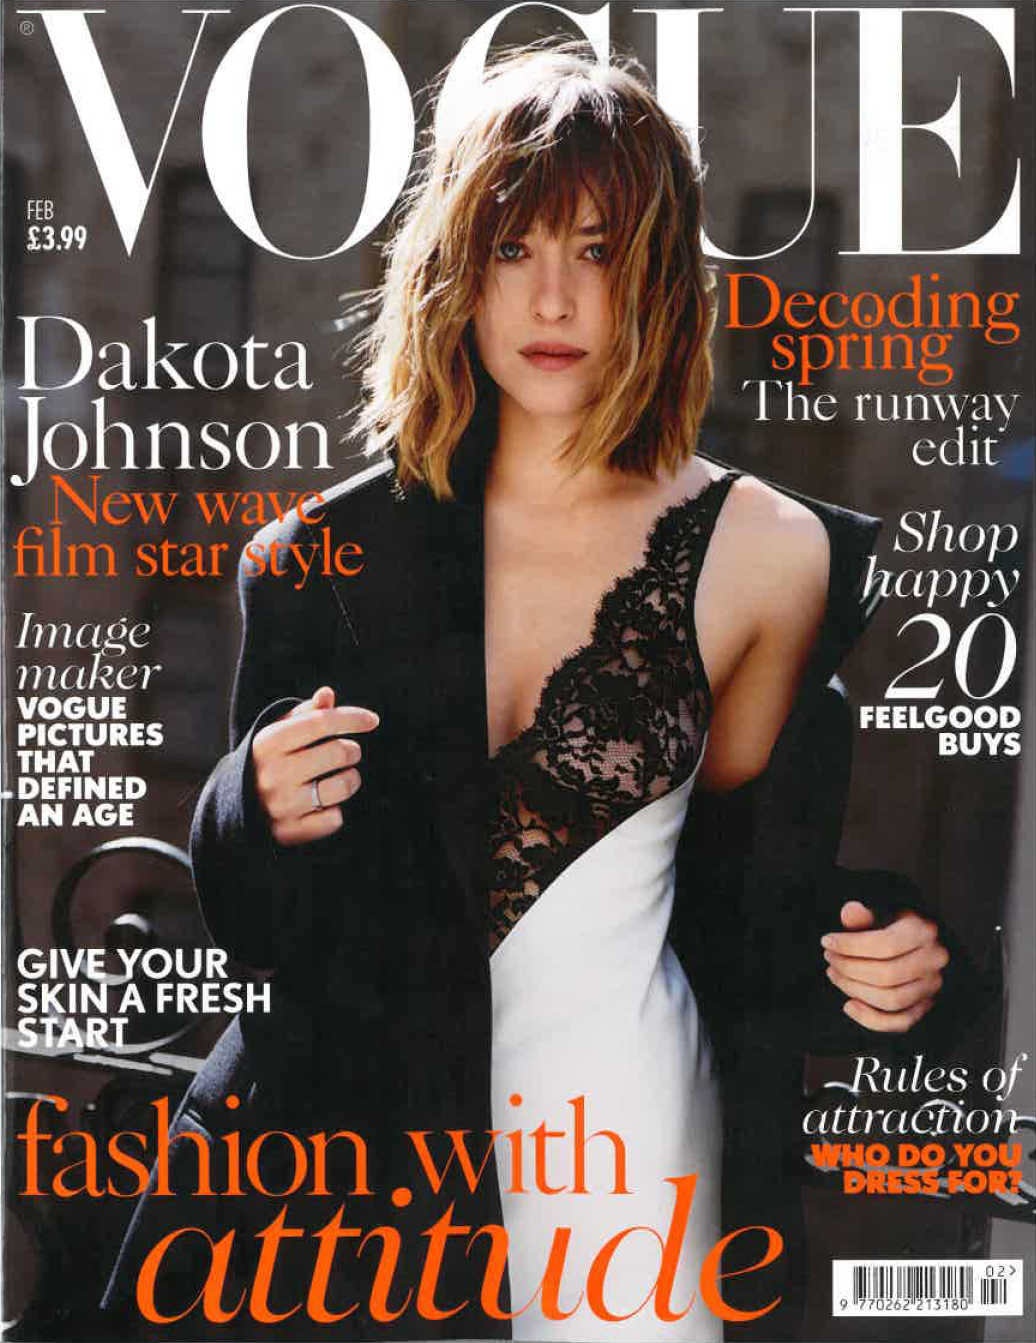 Vogue Feb 2016